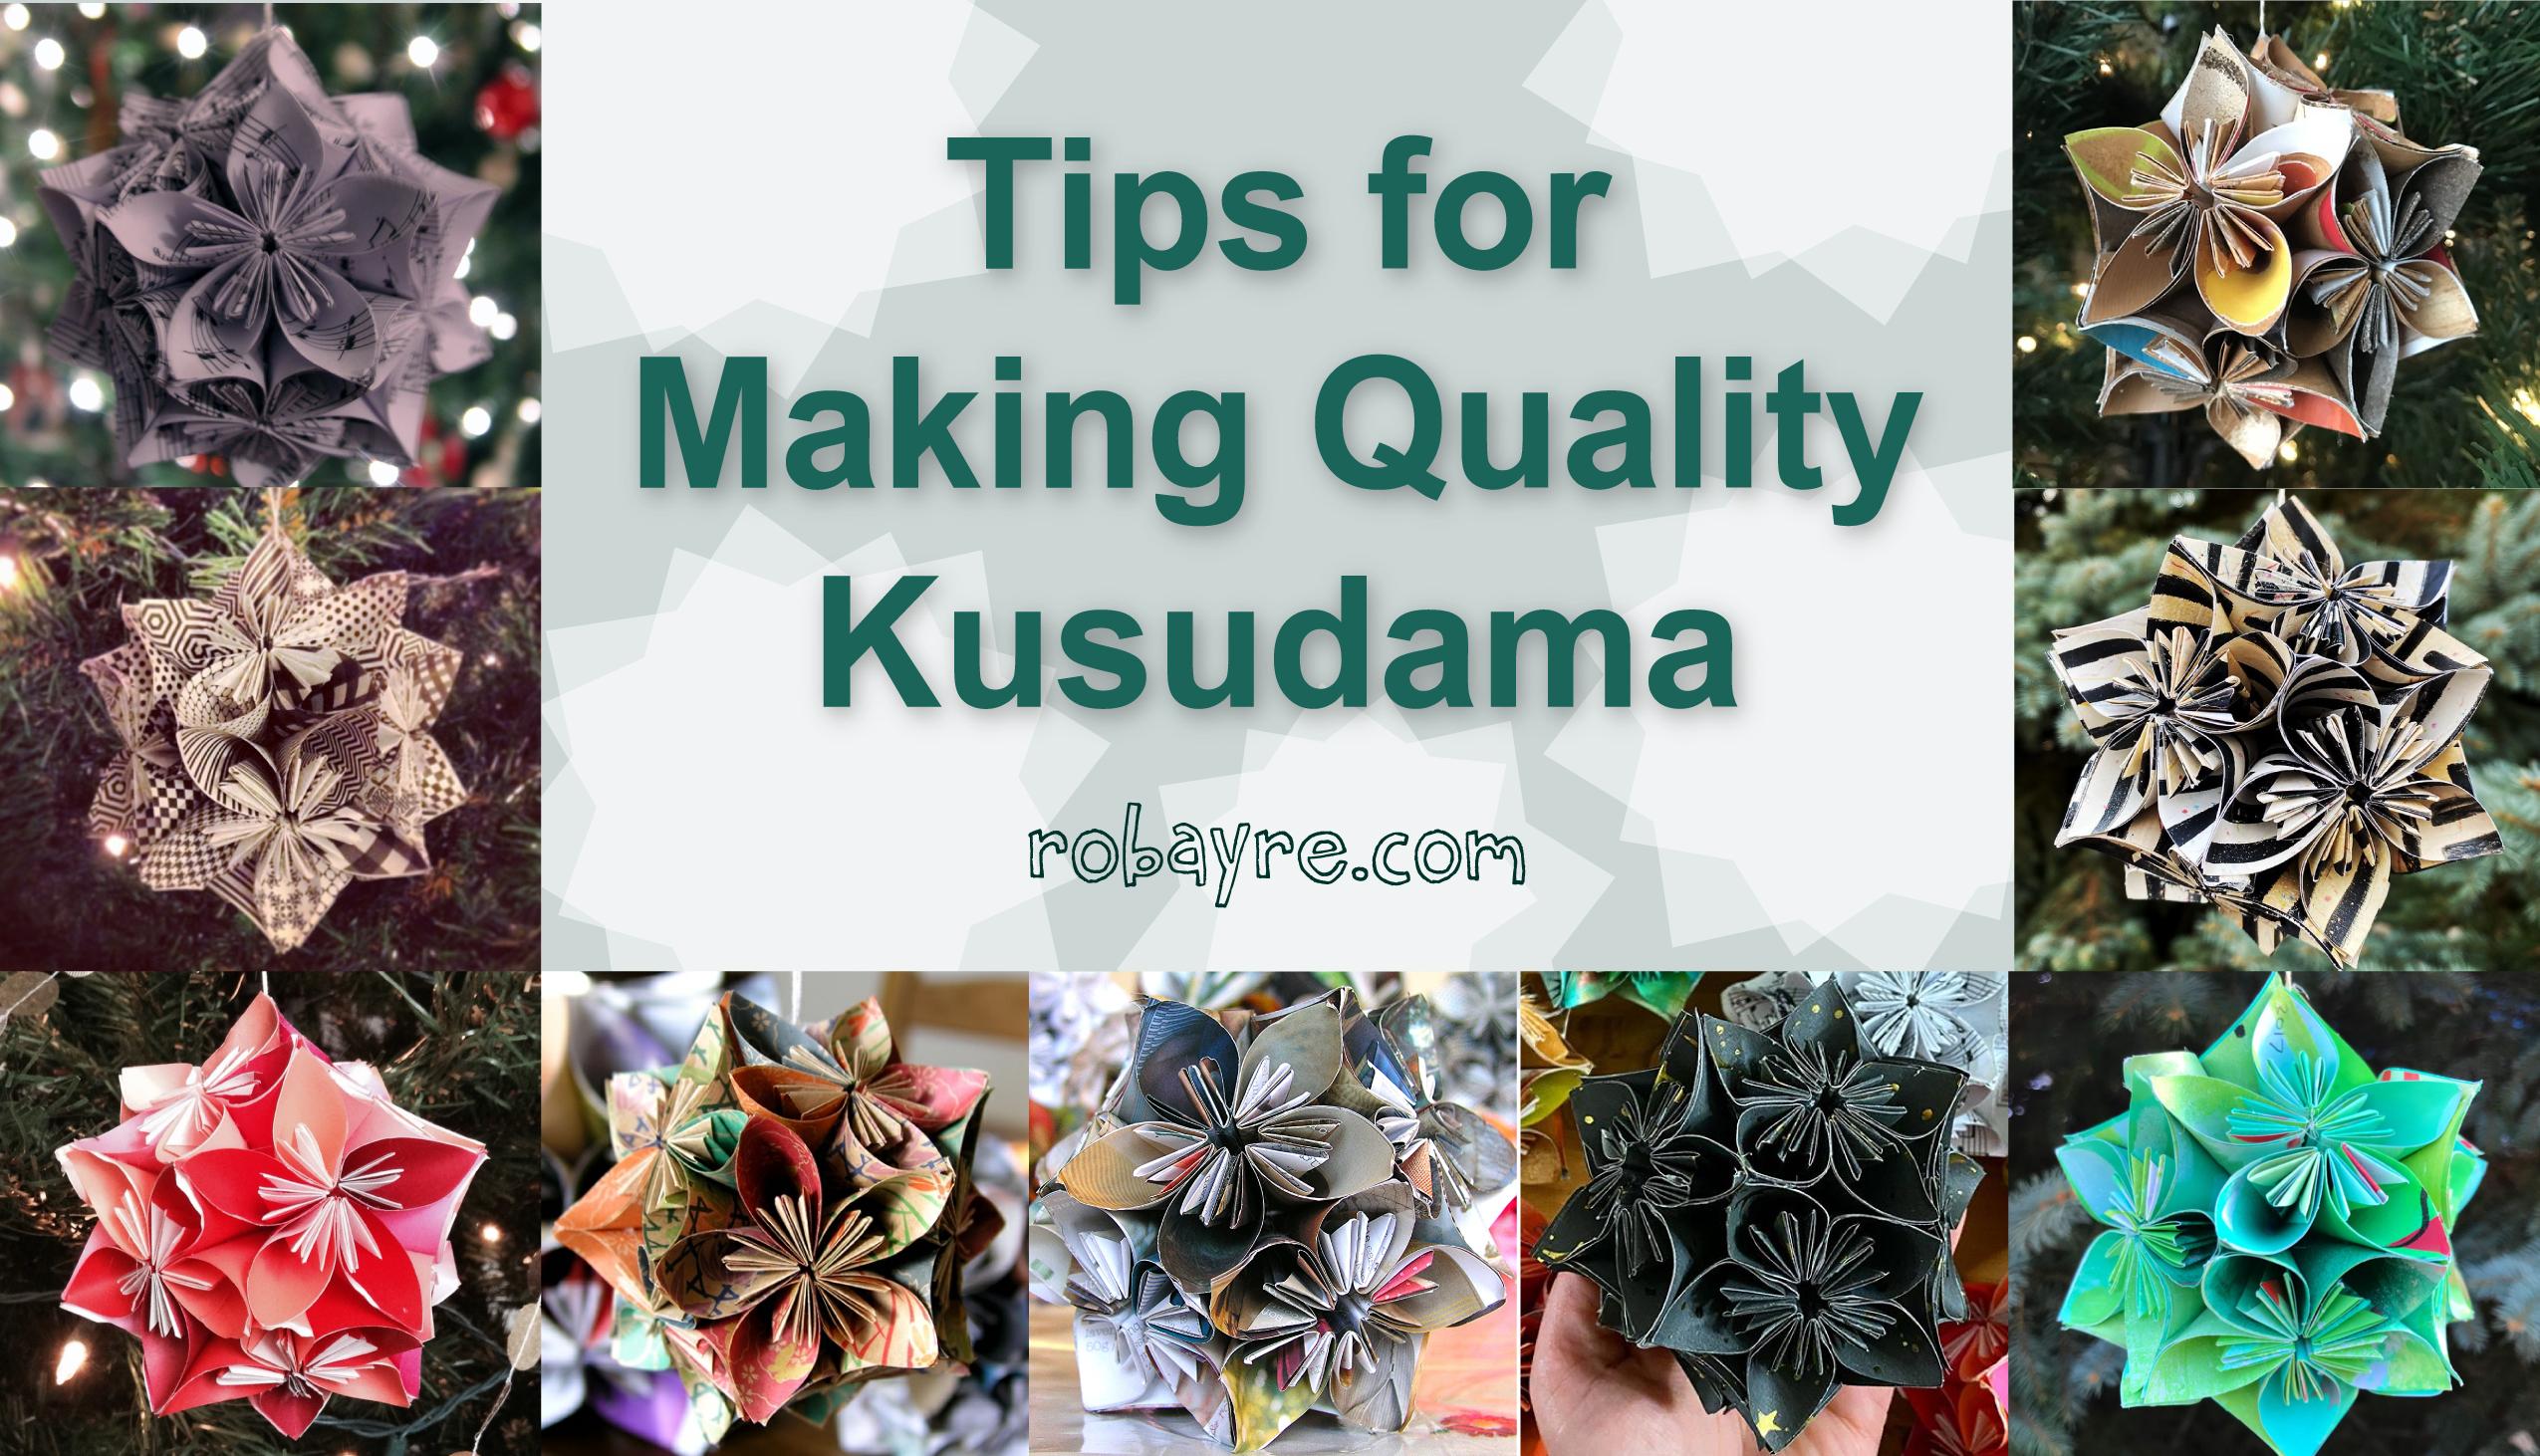 Tips for Making Quality Kusudama